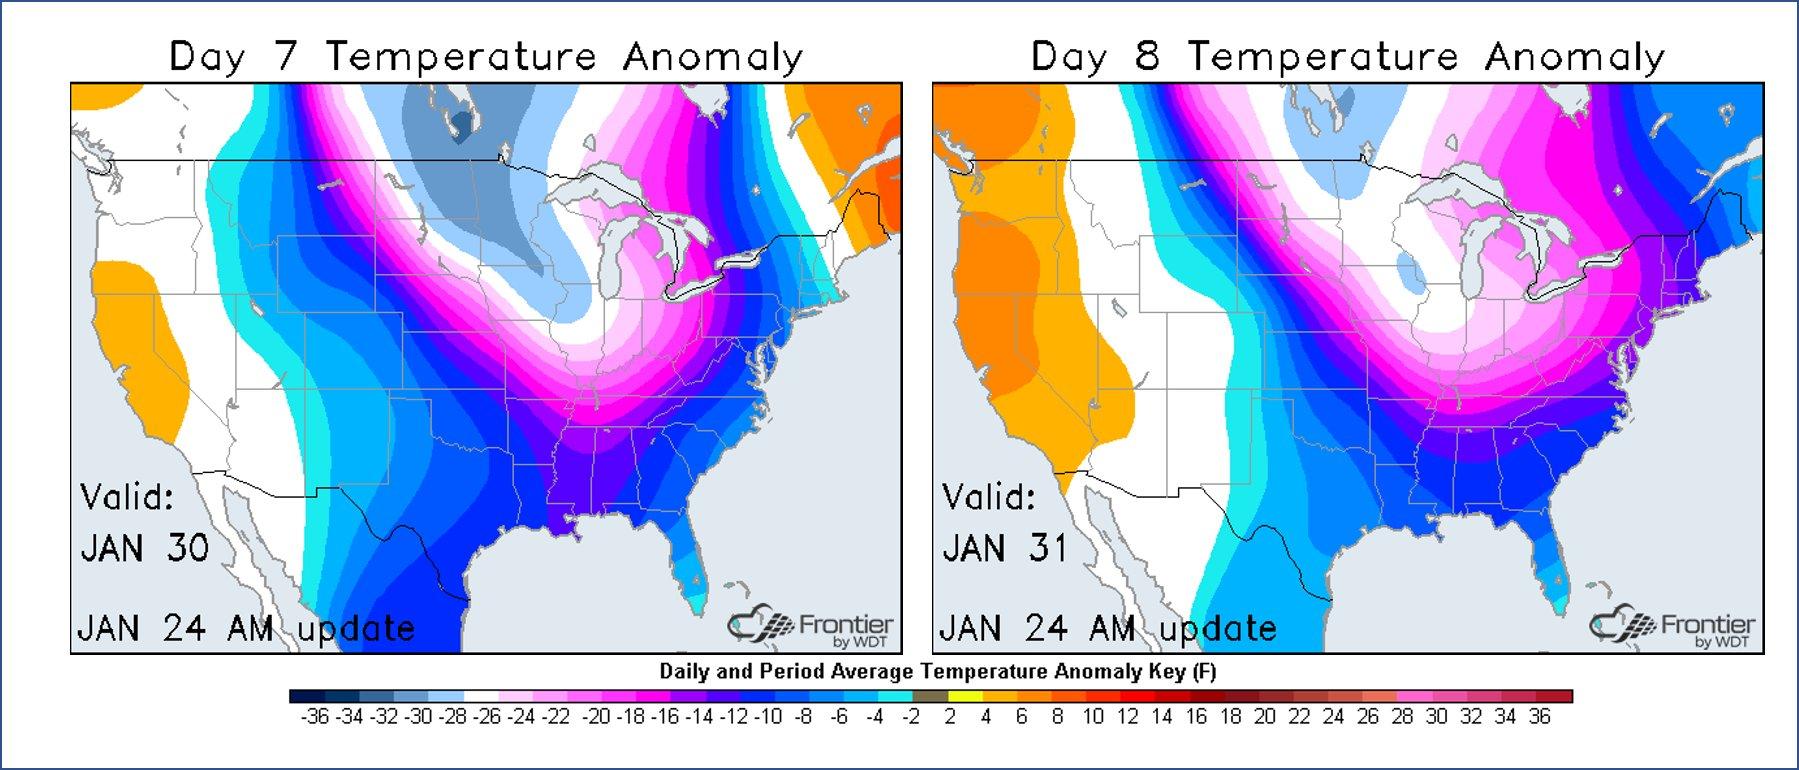 Frontier Temperature Anomalies